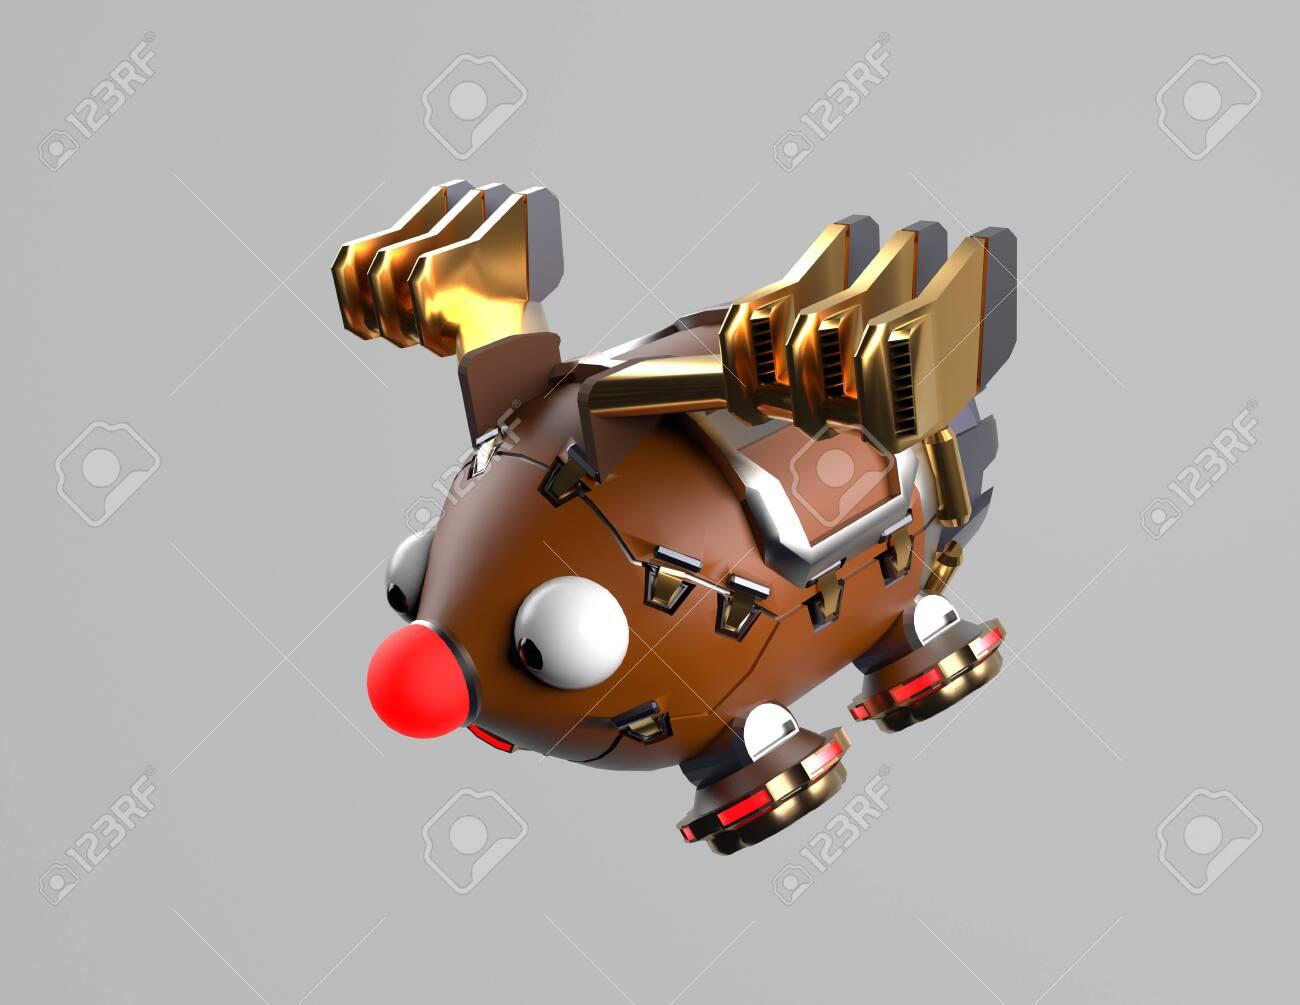 The robot deer,fly deer,christms deer,3d render. - 137047403